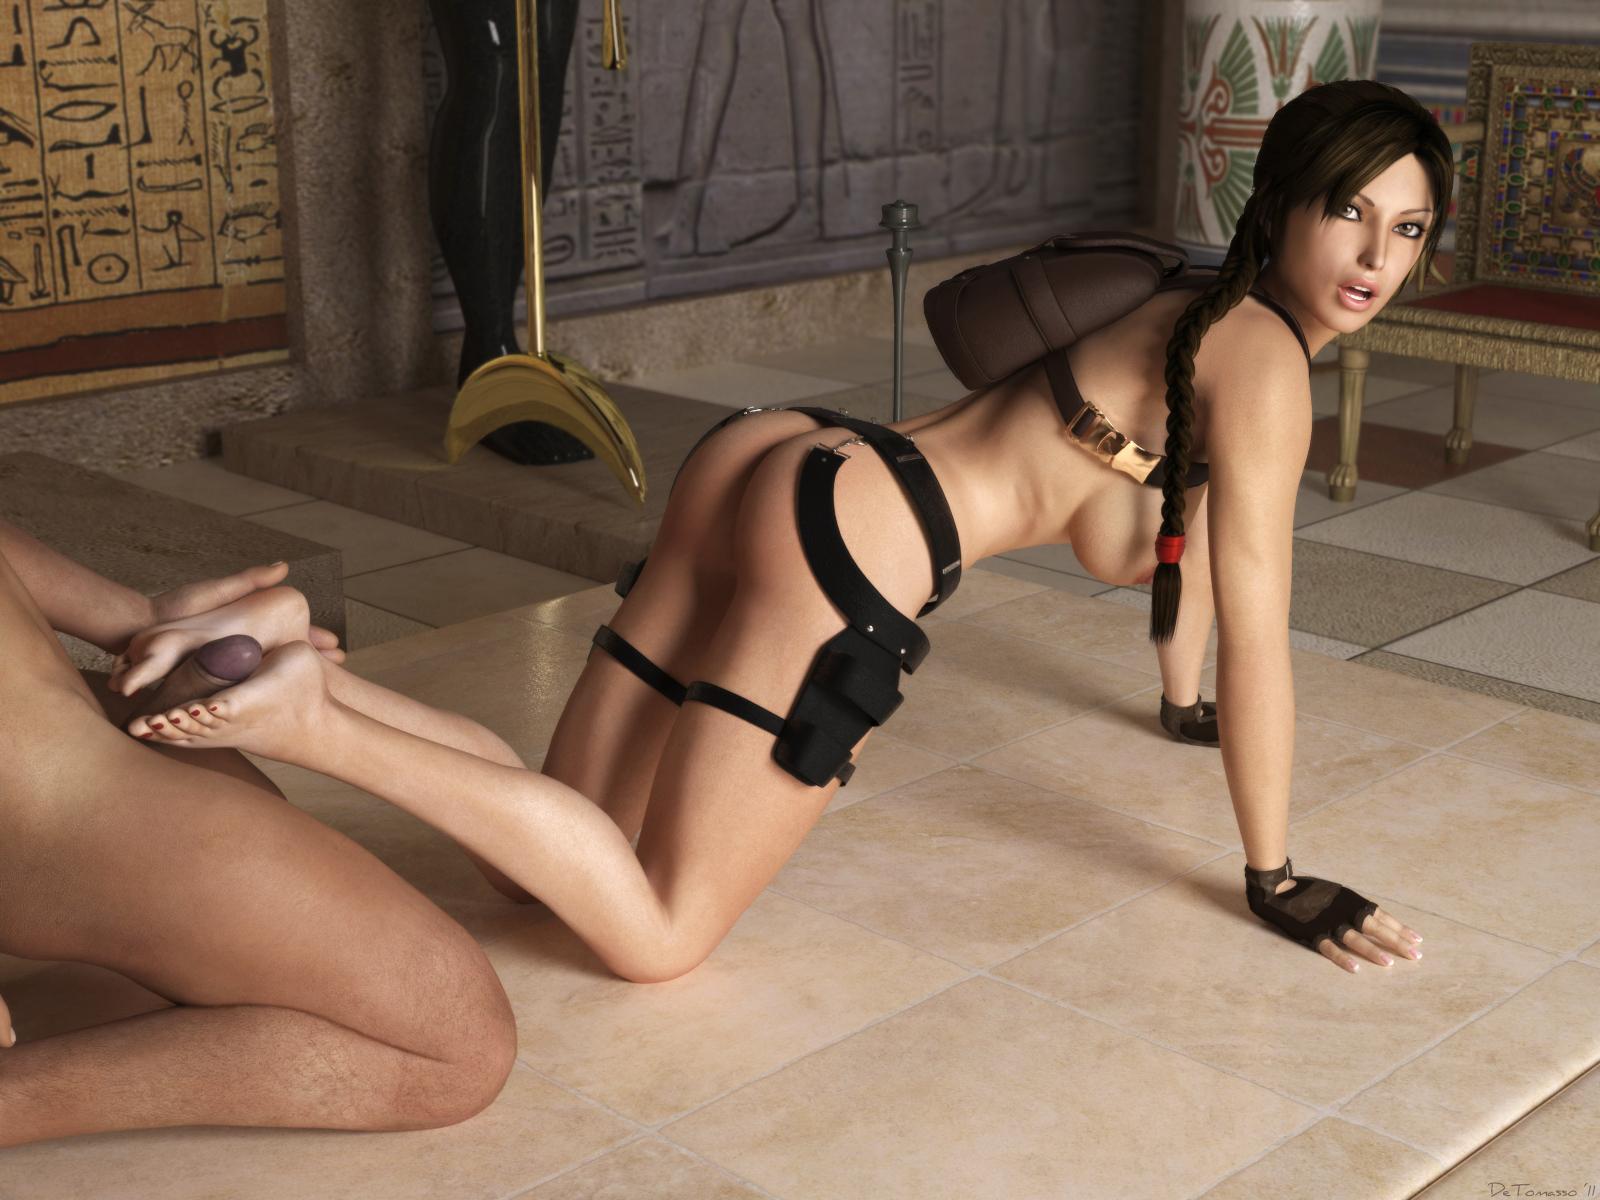 3D Tomb Raider Xxx feet wank - lara croft hentai doujinshi